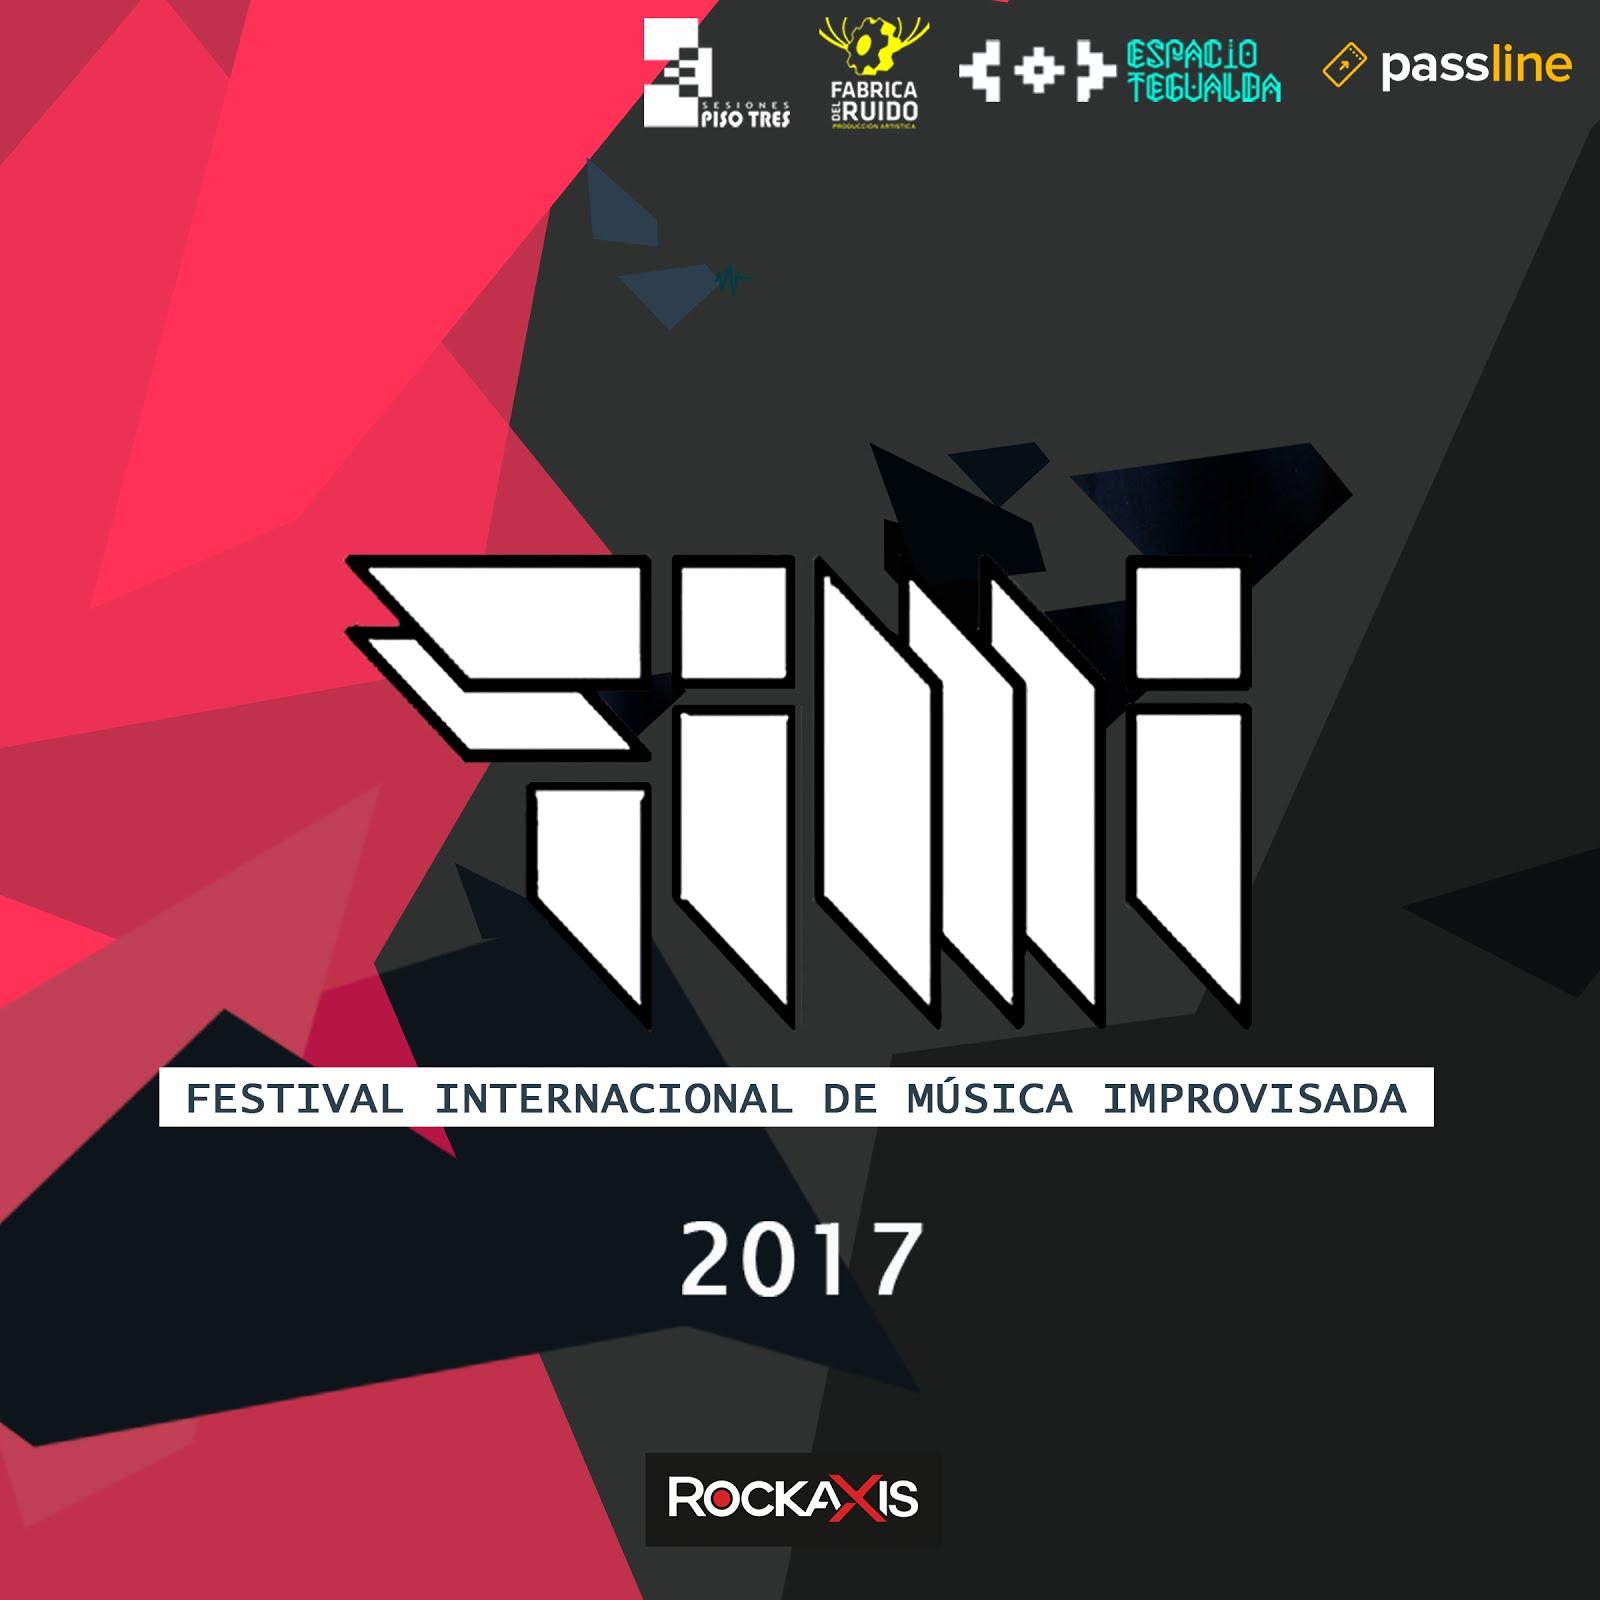 FIMI 2017